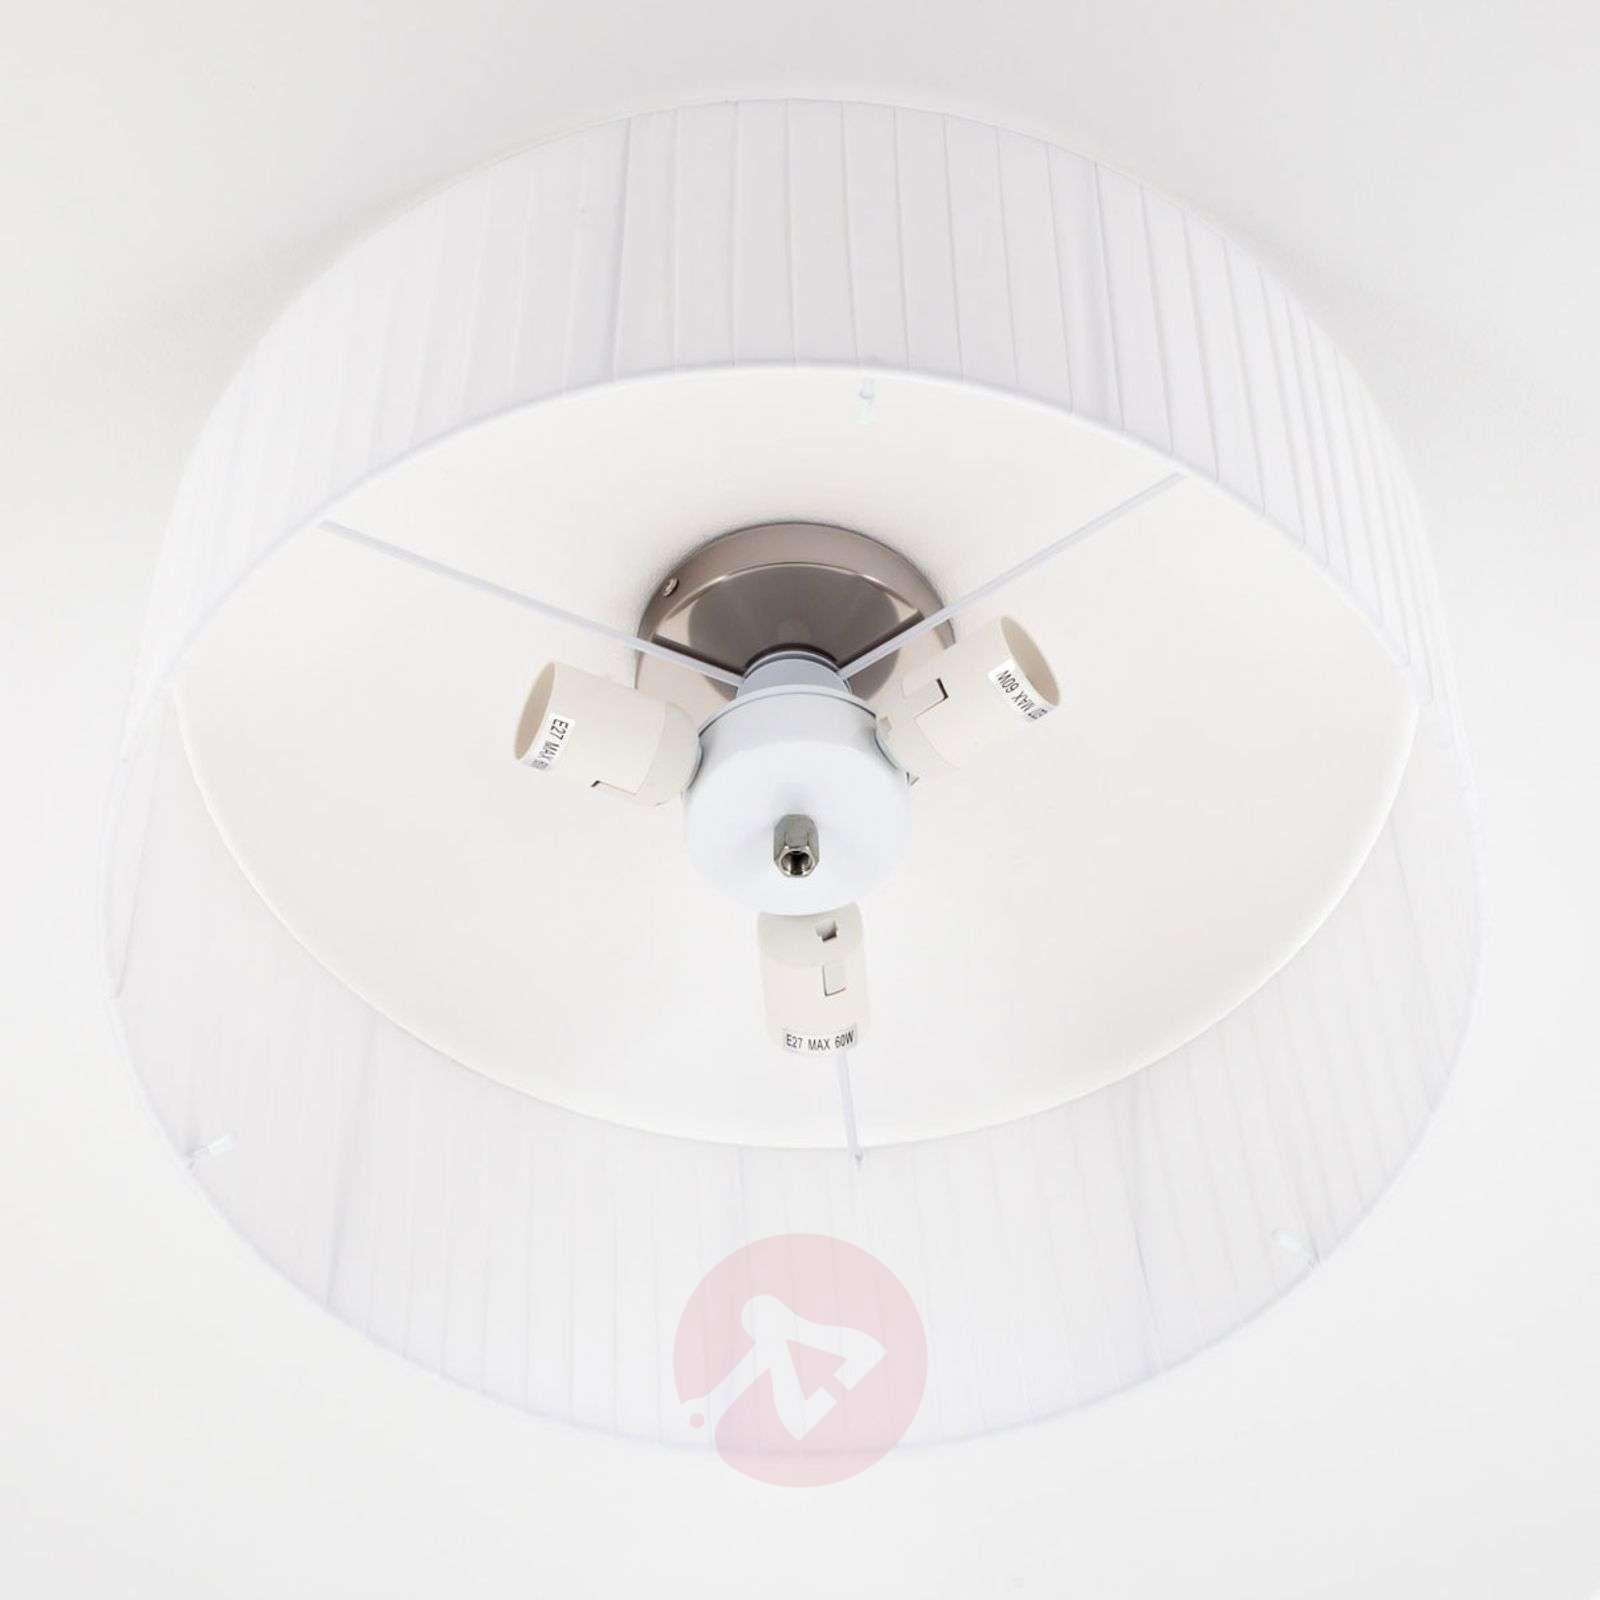 Plissé ceiling light Melda with acrylic diffuser-9620044-02